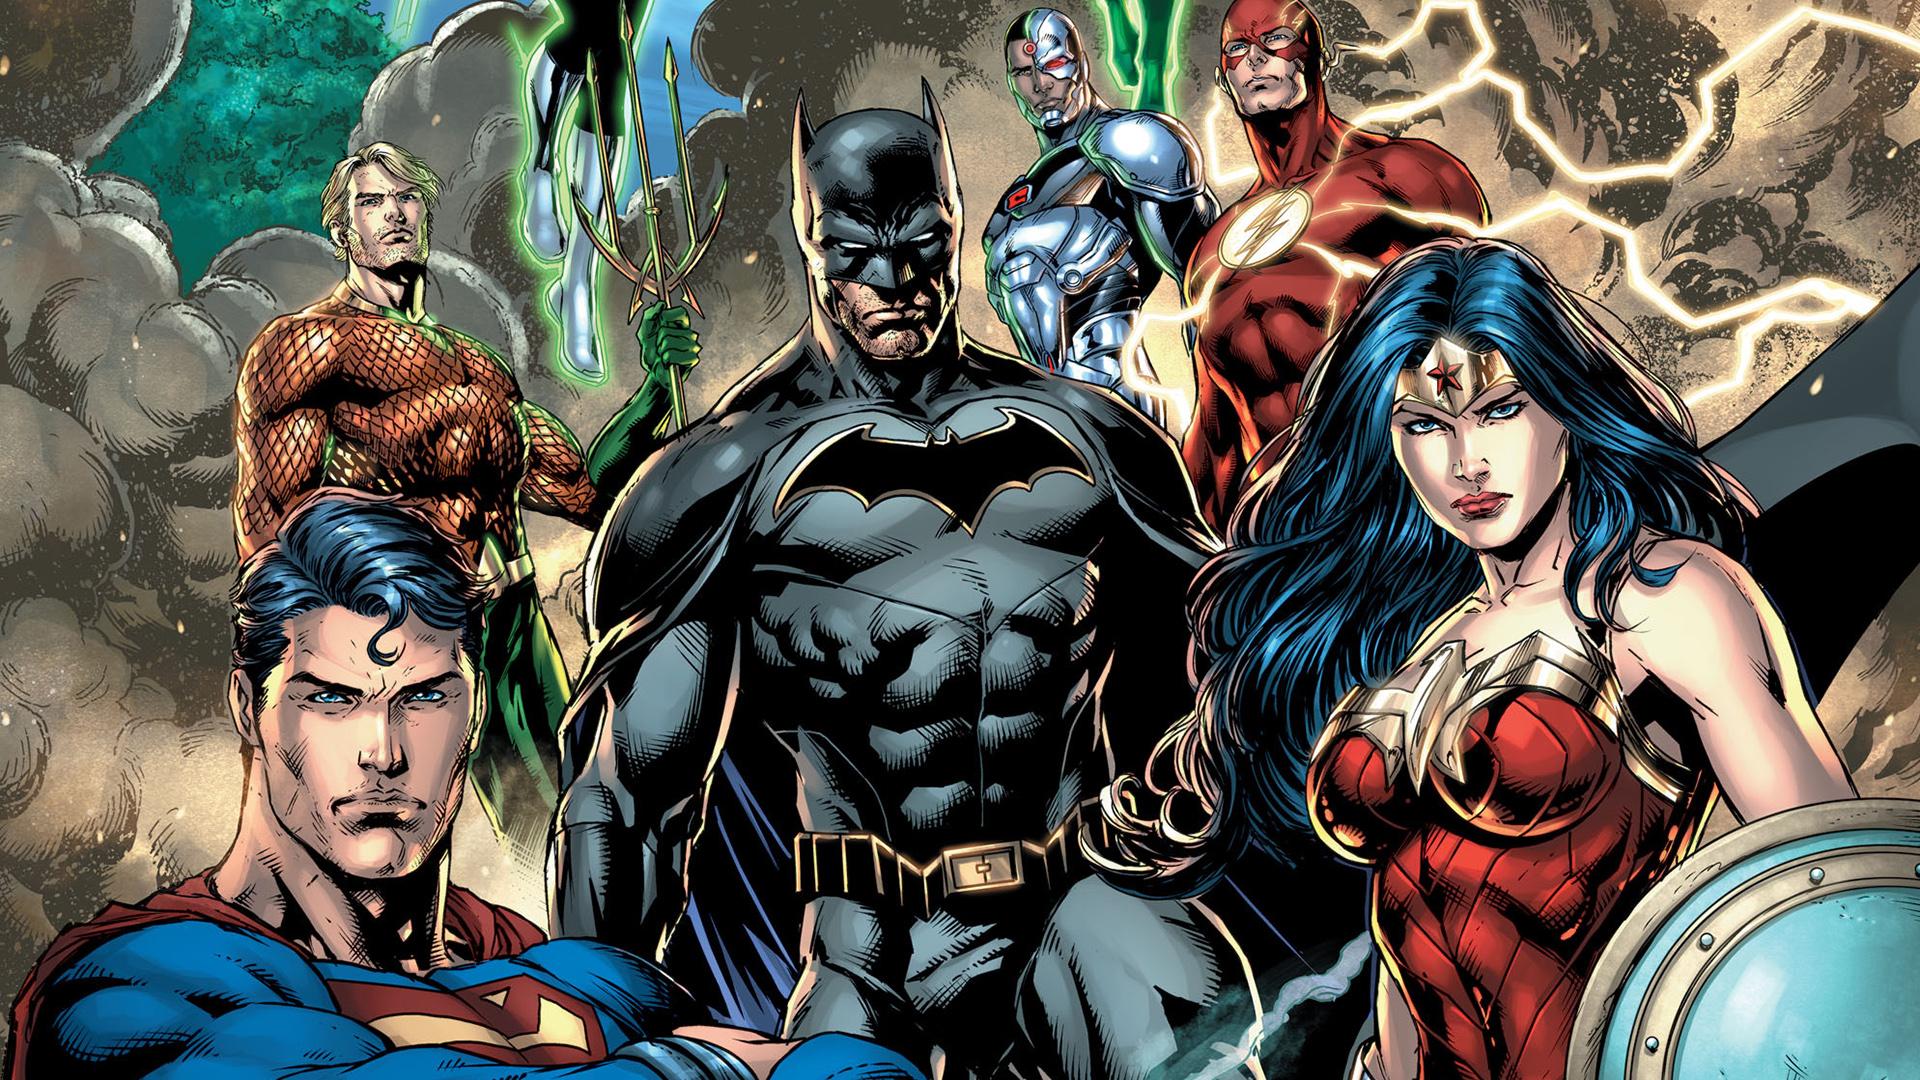 Justice League Dc Comics Superheroes Wallpapers: Justice League Dc Comic Art, HD Superheroes, 4k Wallpapers